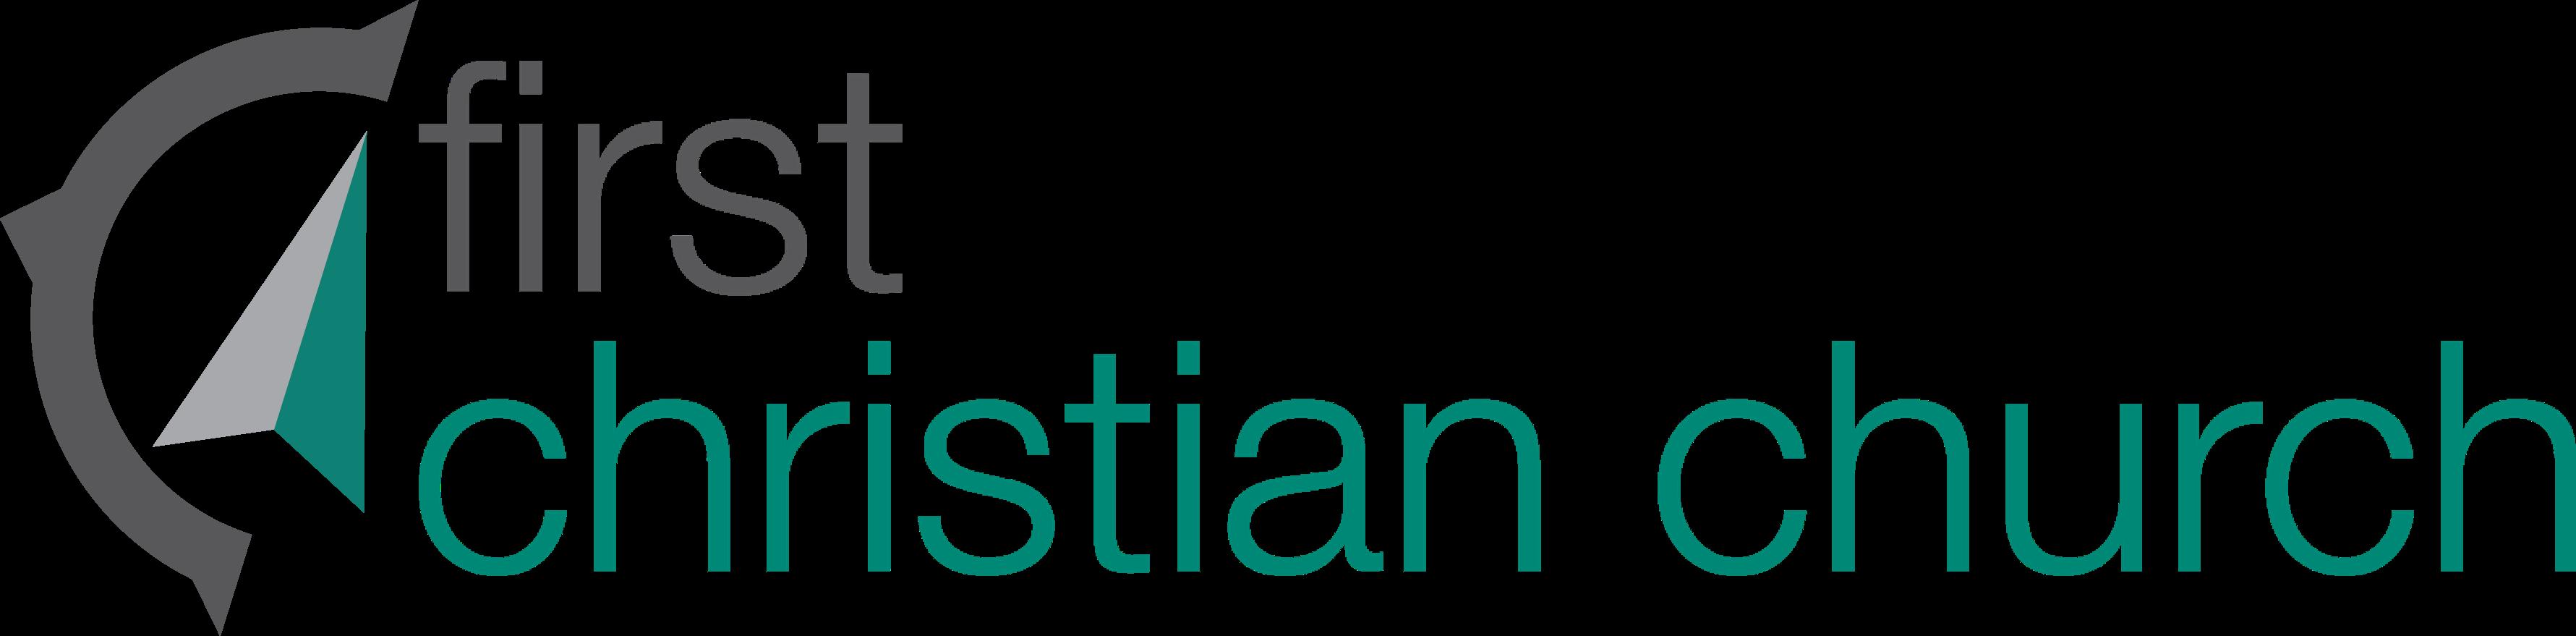 First christian springfield